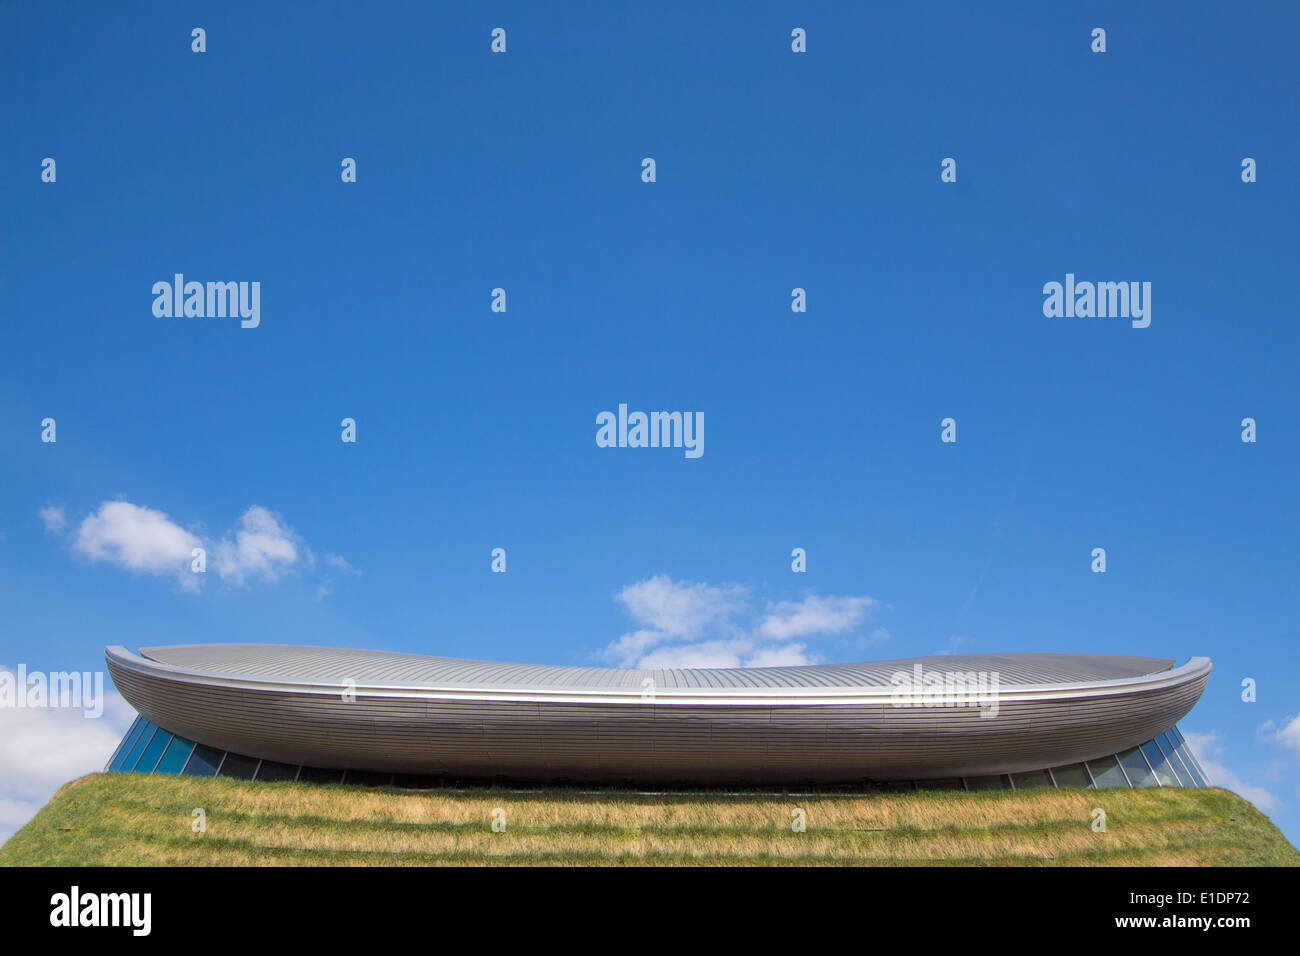 London Aquatics Centre, Queen Elizabeth Olympic Park, London 2012 - Stock Image